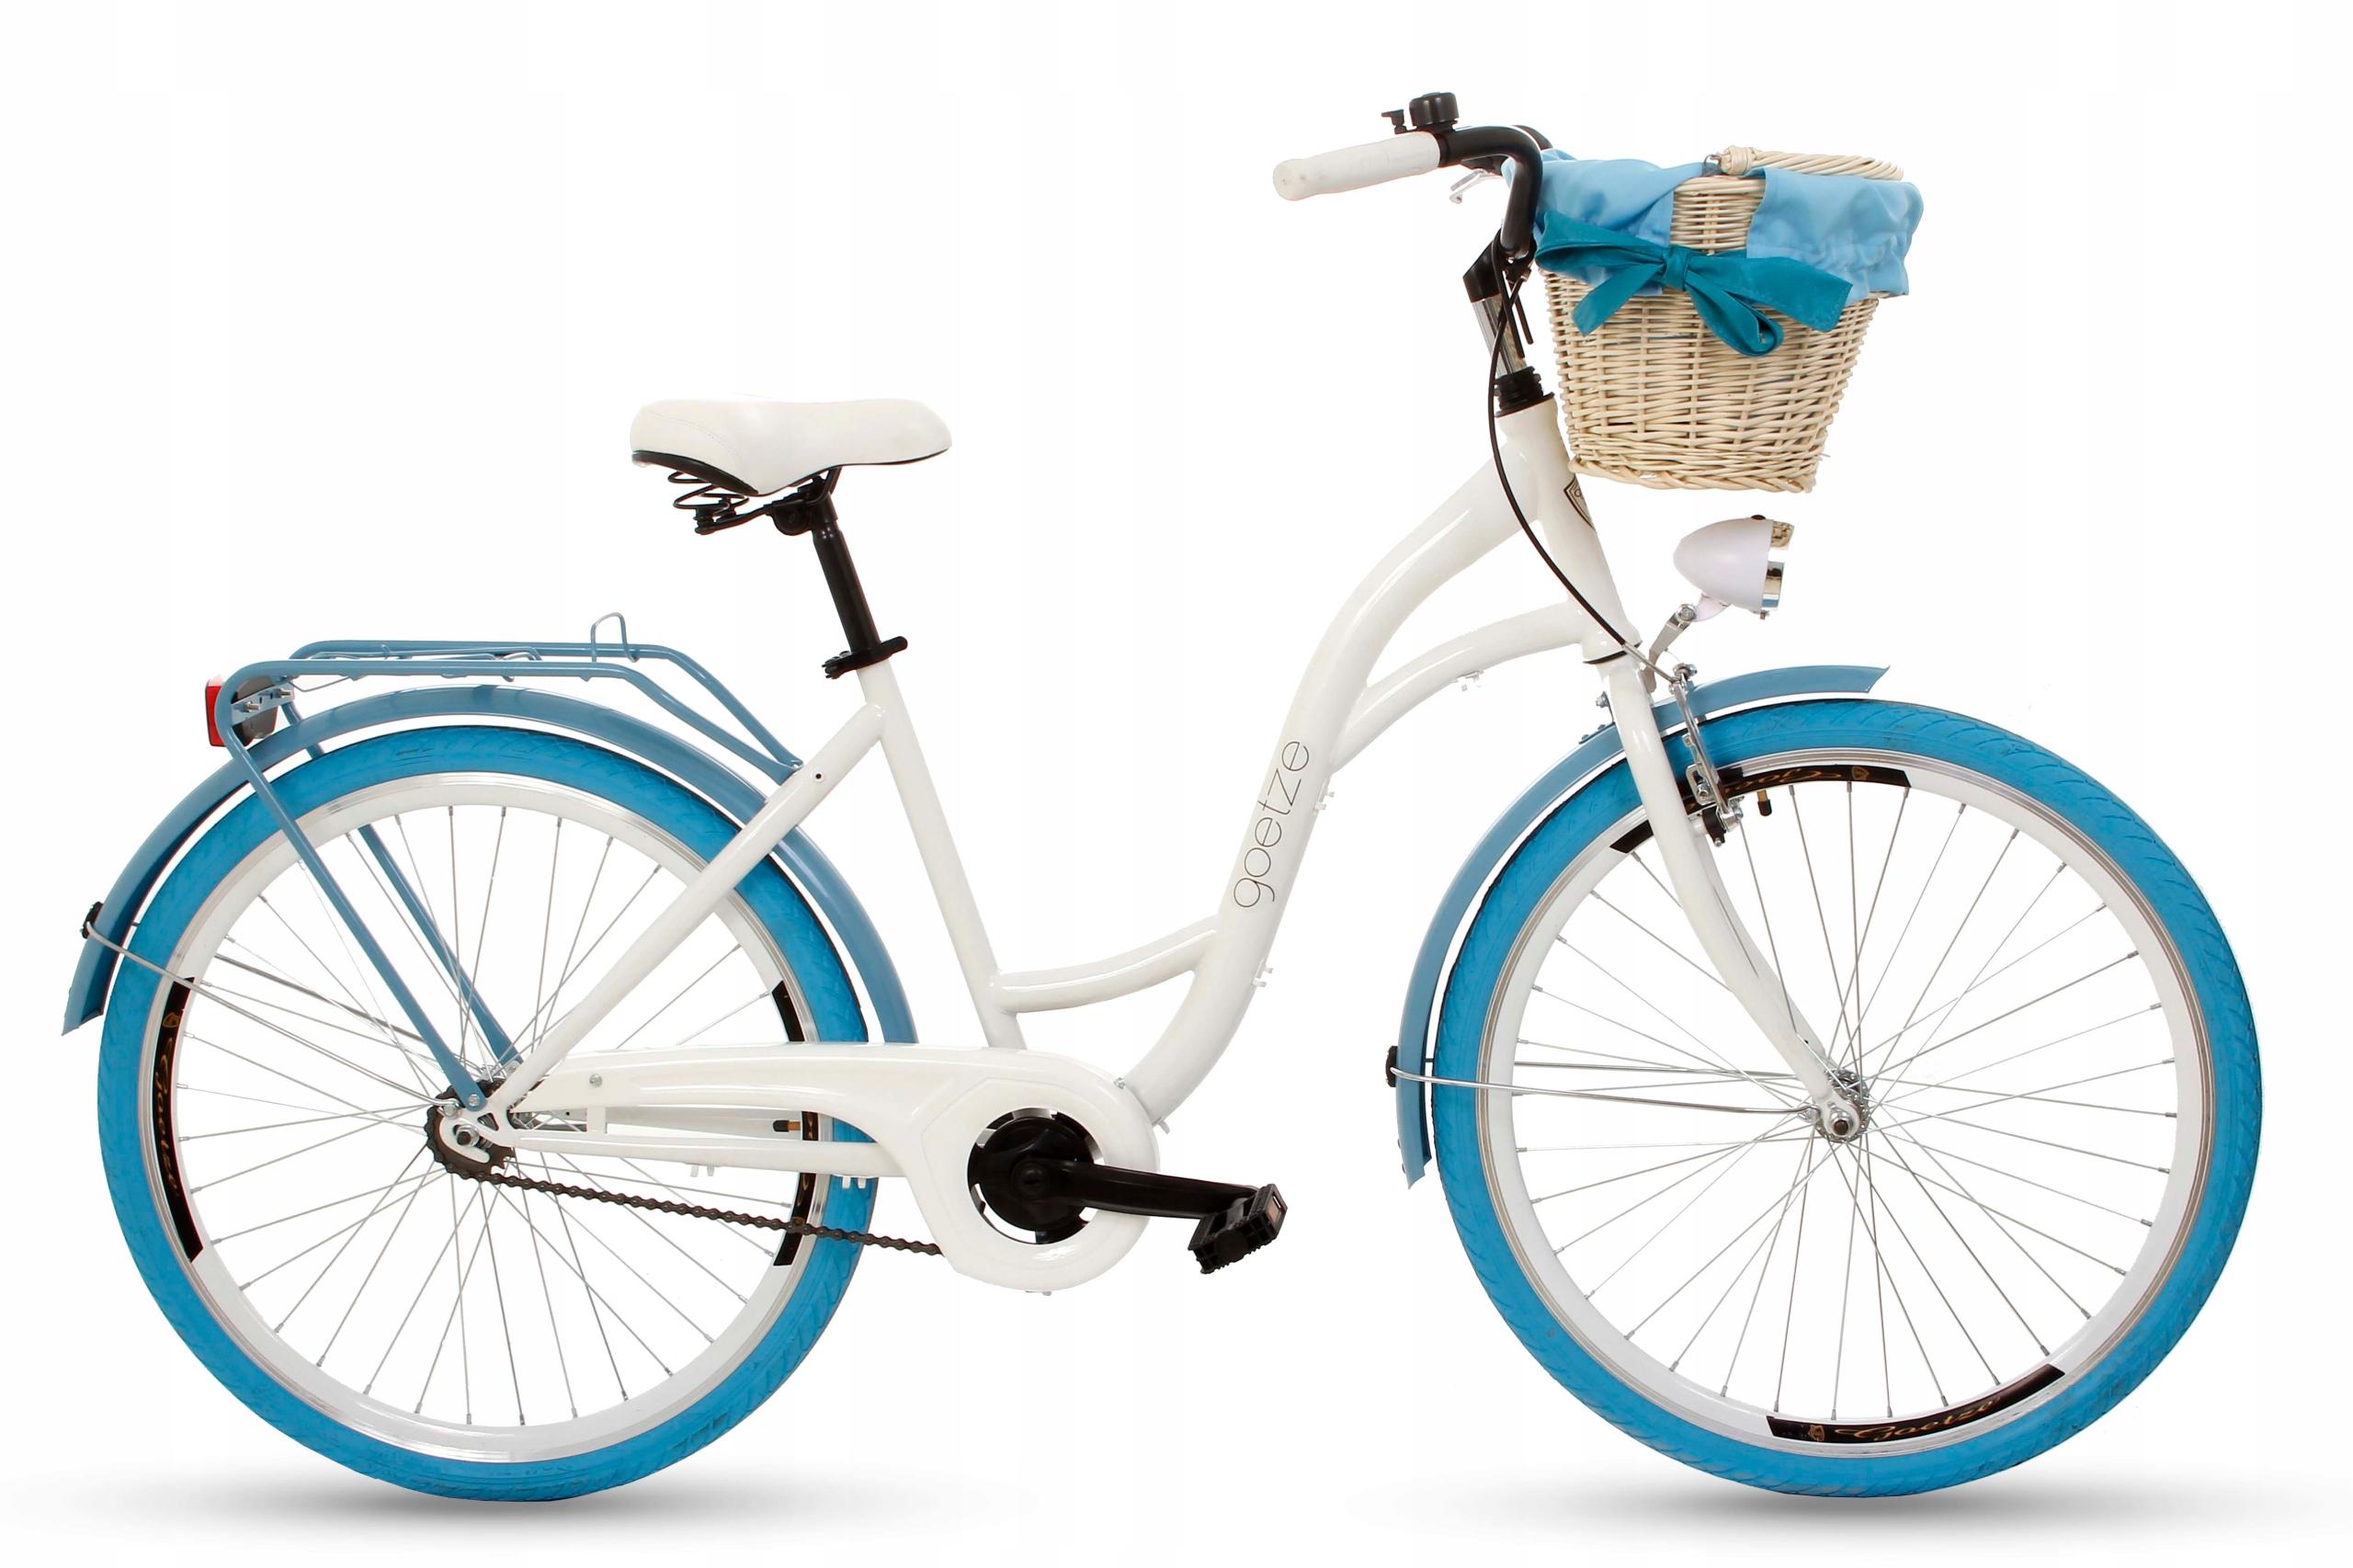 Dámsky mestský bicykel Goetze COLORS 26 košík!  Veľkosť rámu 17 palcov